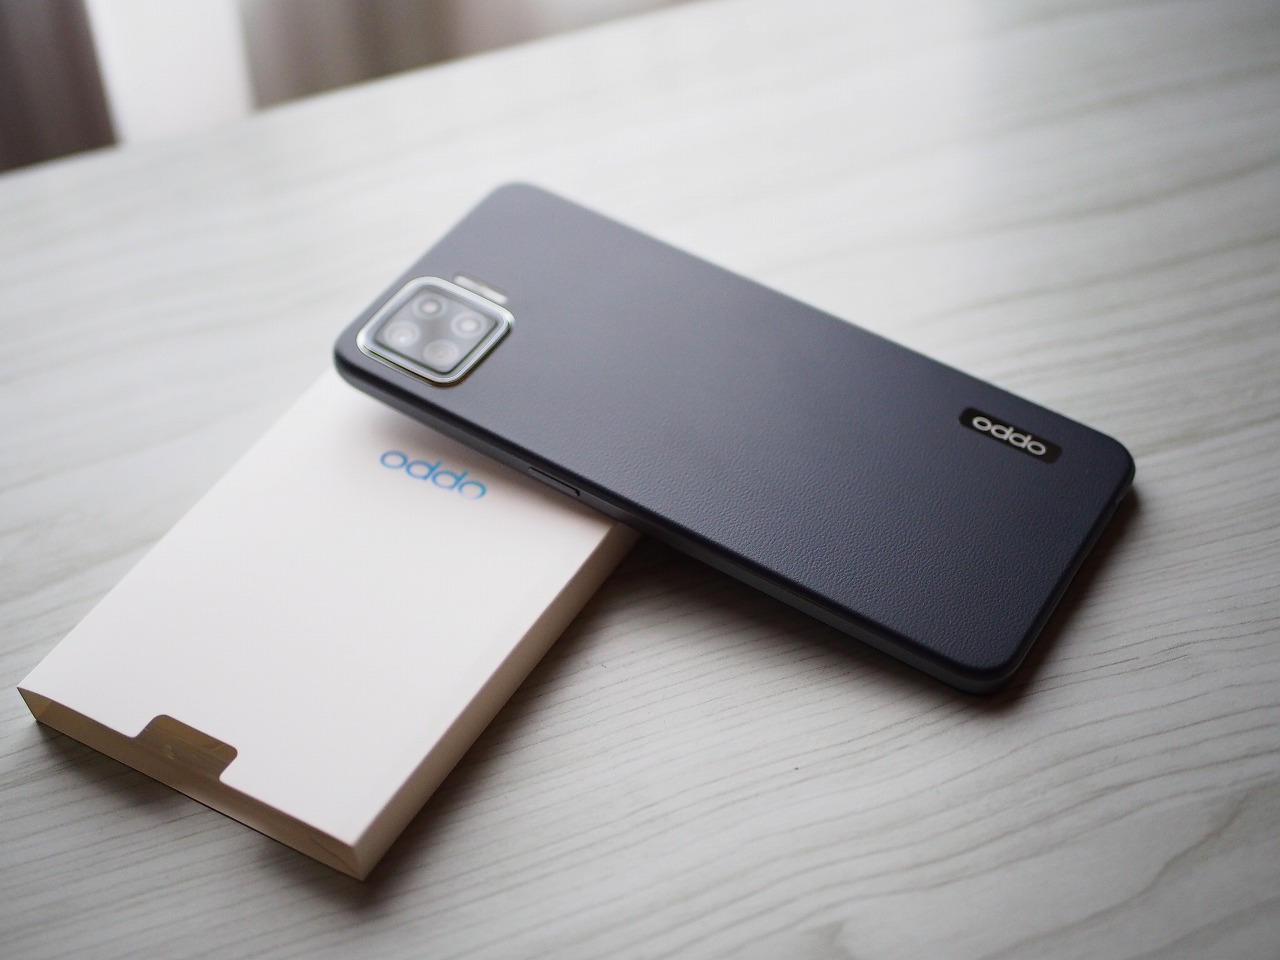 【Android】楽天回線エリア内でパートナー回線接続 機種を変えてみたら 【OPPO A73